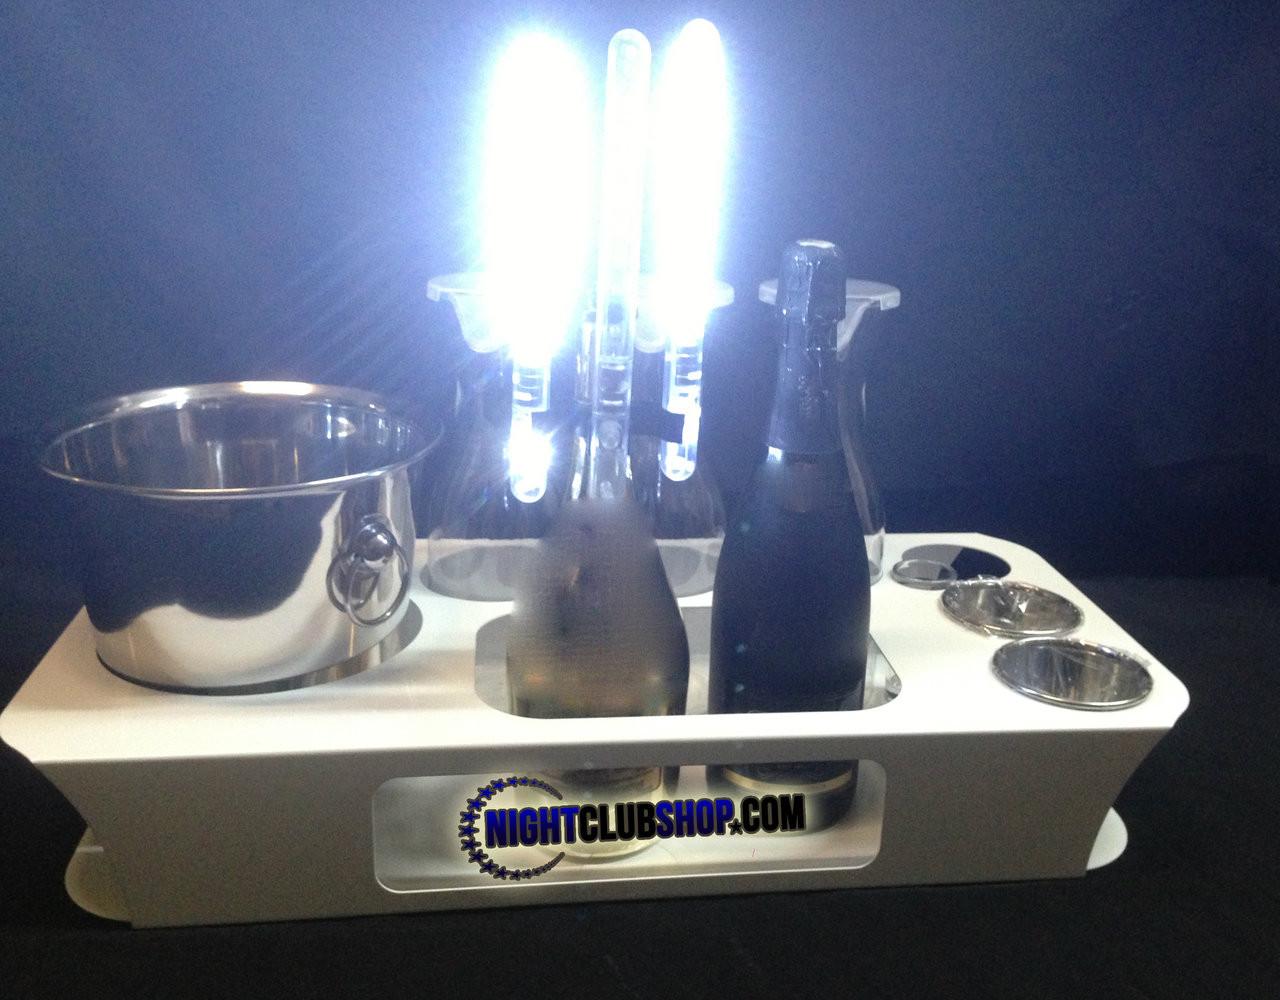 silver, logo, led, nitesparx, name, changer, bottle service, tray, vip, custom, nightclub, club, bar, delivery, caddie, champagne, bottle, presentation, high quality, scene